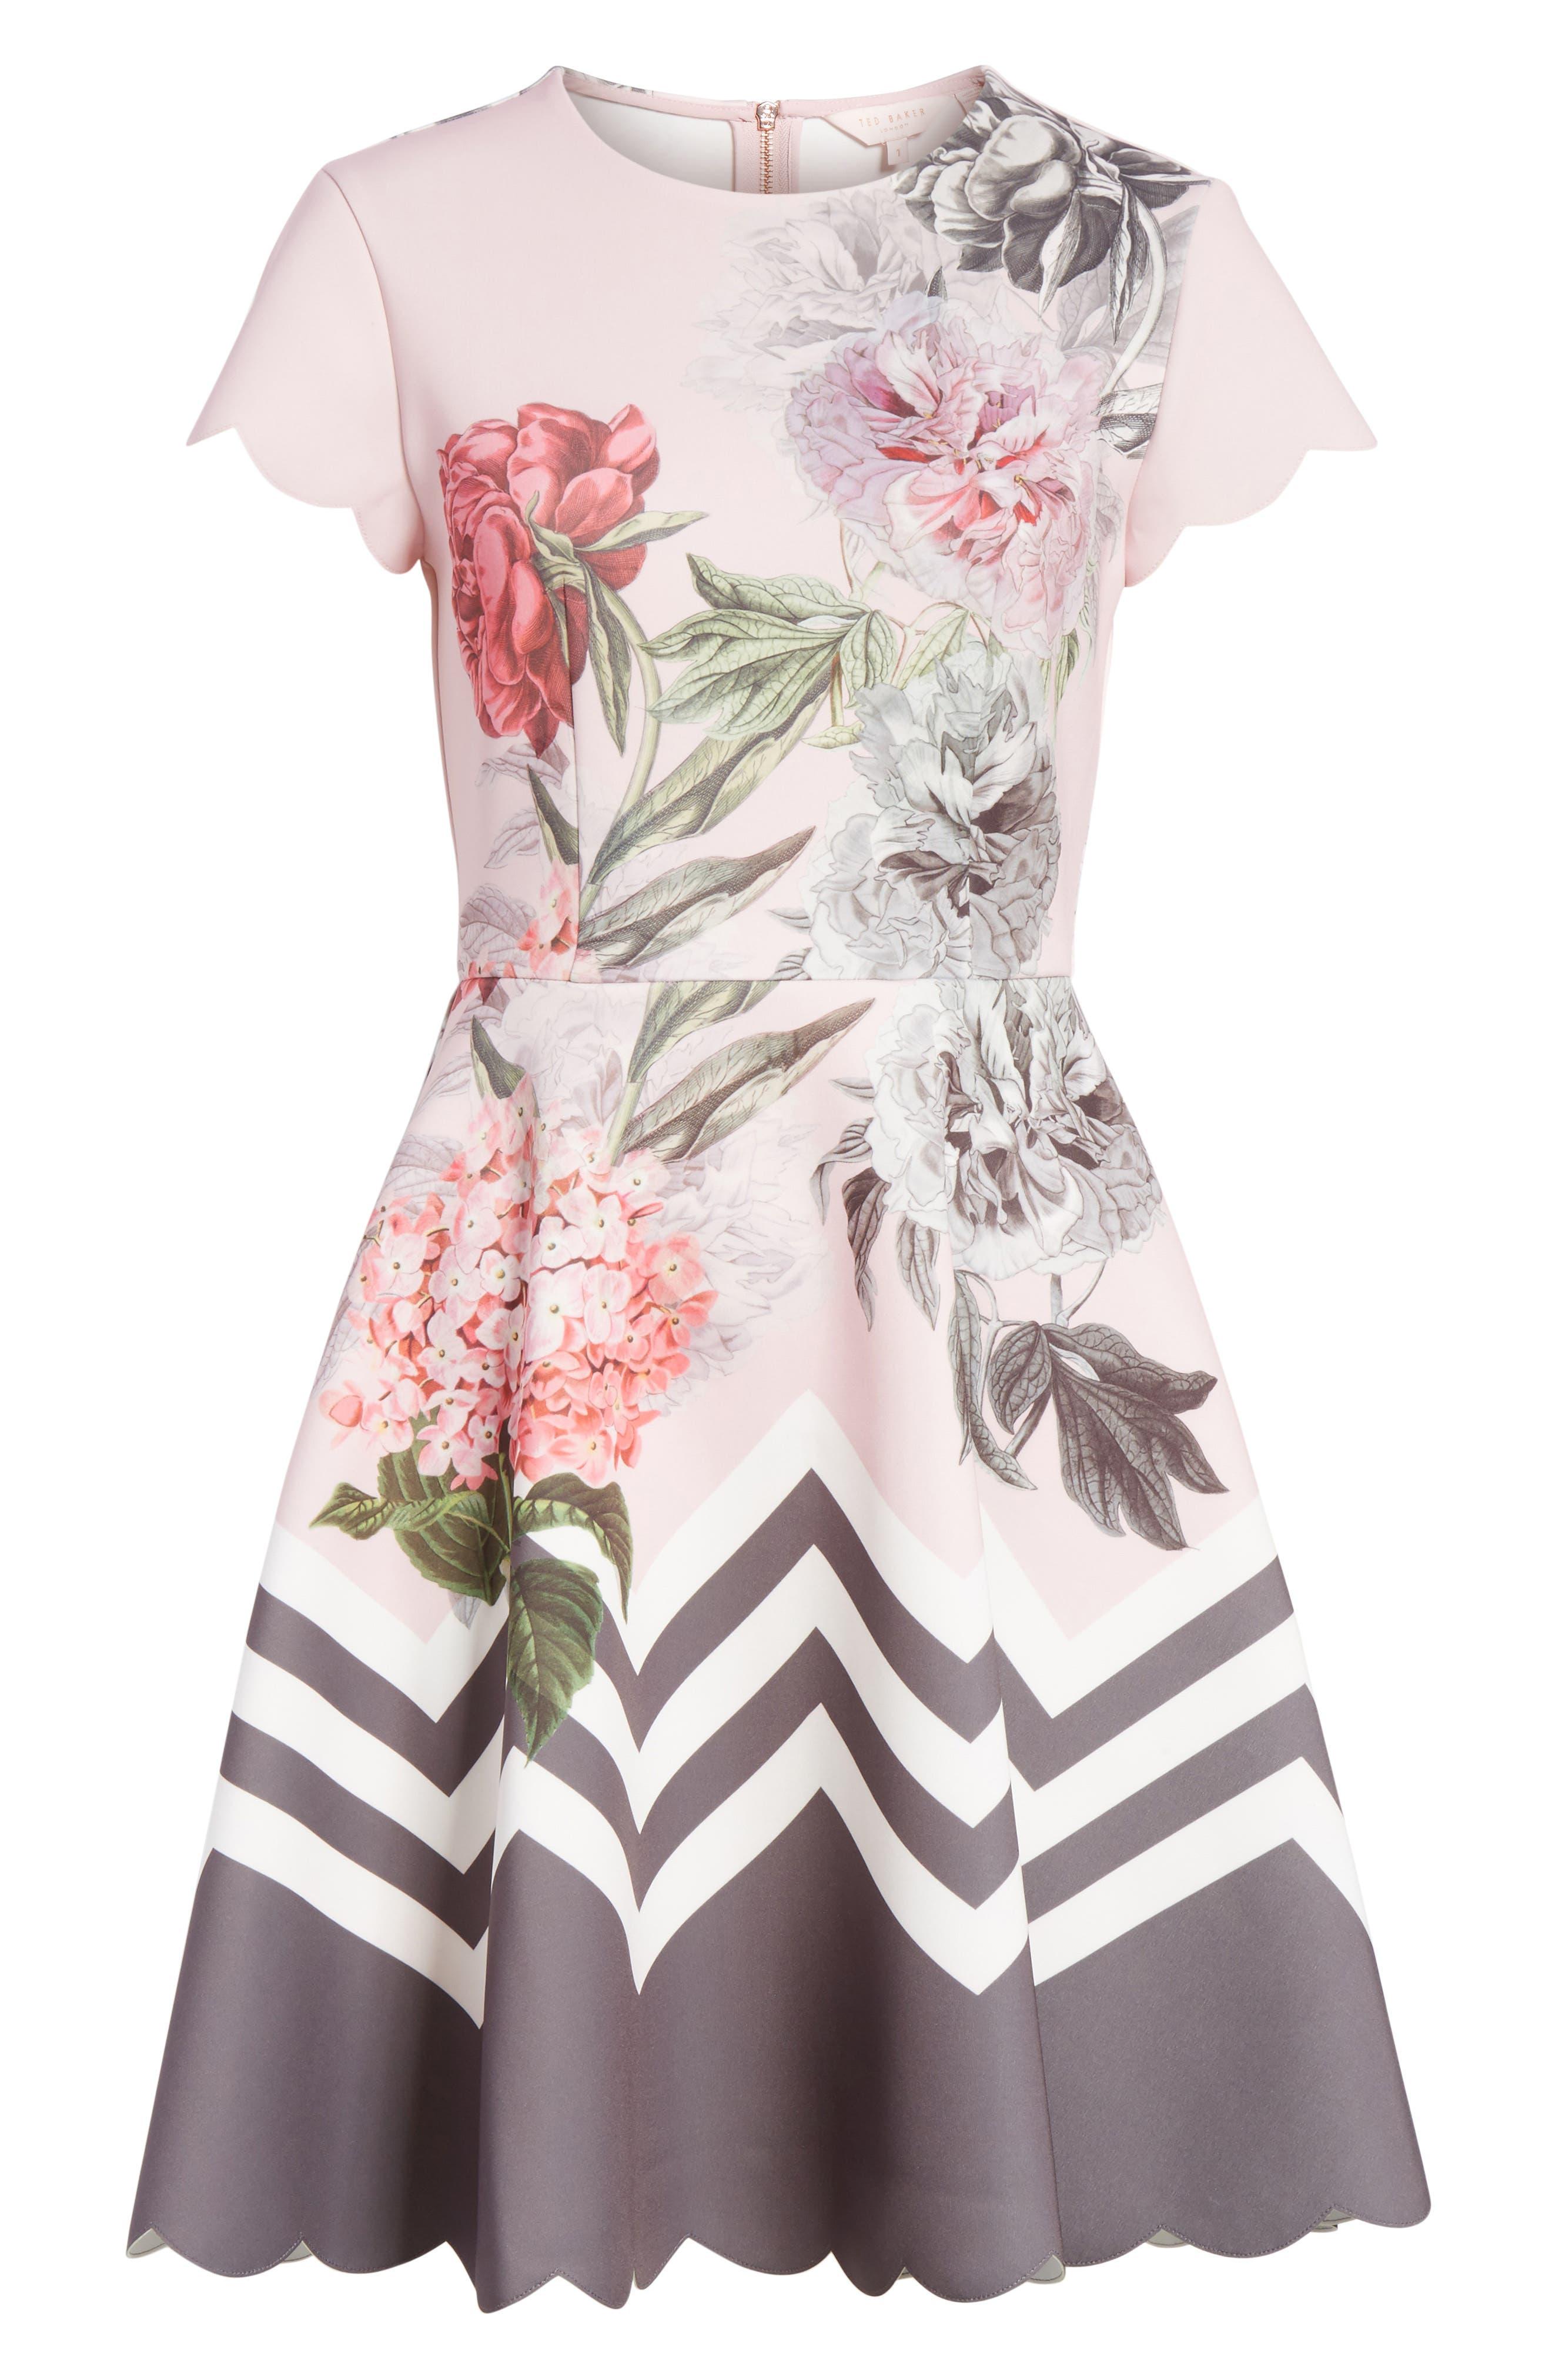 Palace Gardens Skater Dress,                             Alternate thumbnail 6, color,                             Dusky Pink